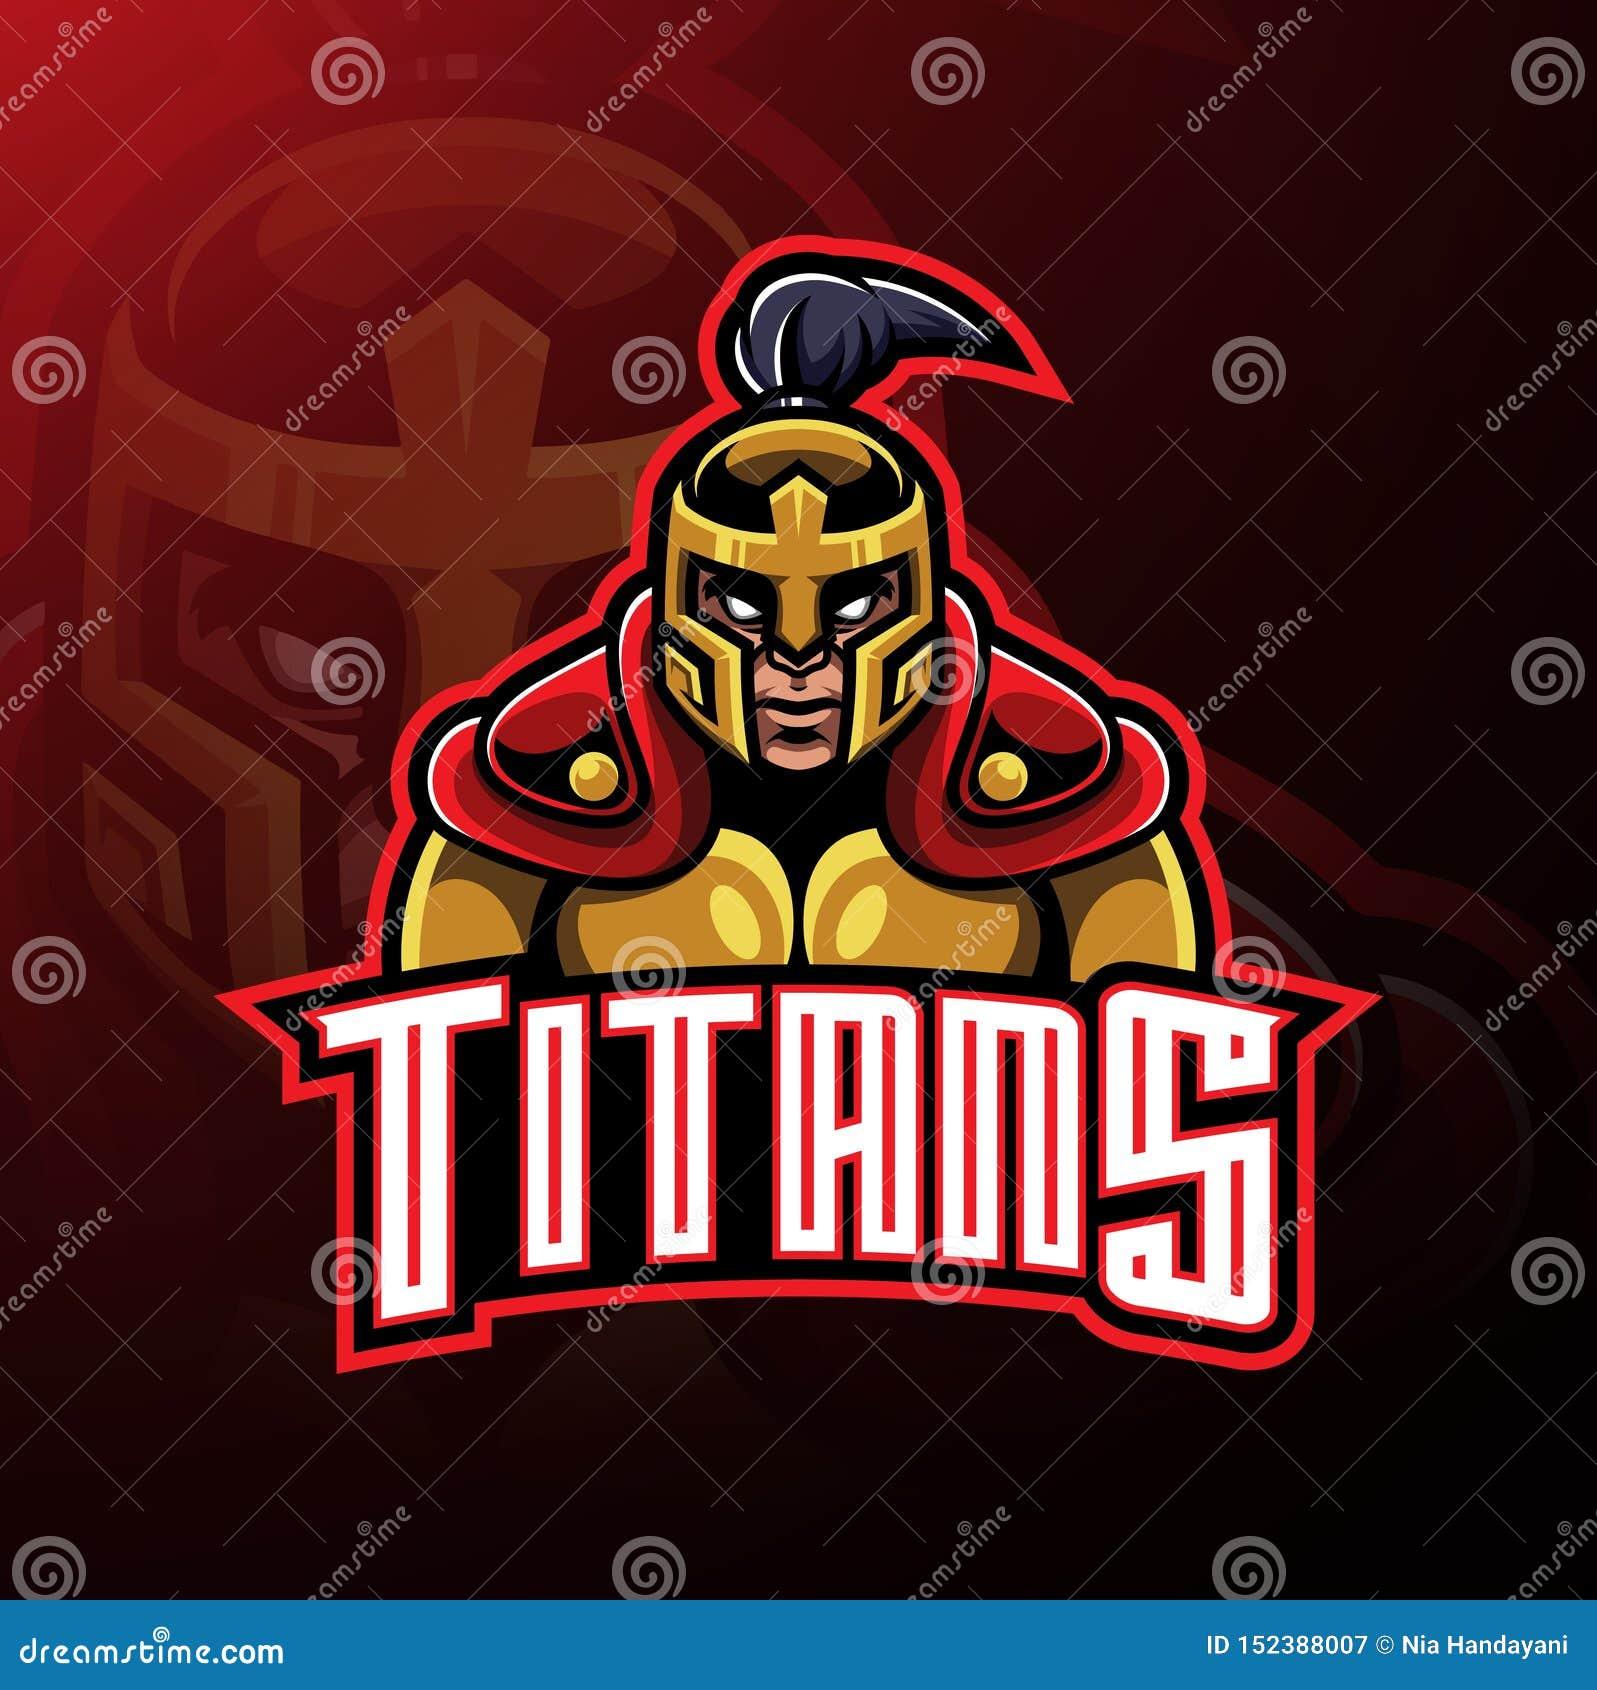 Tytanu wojownika maskotki logo projekt